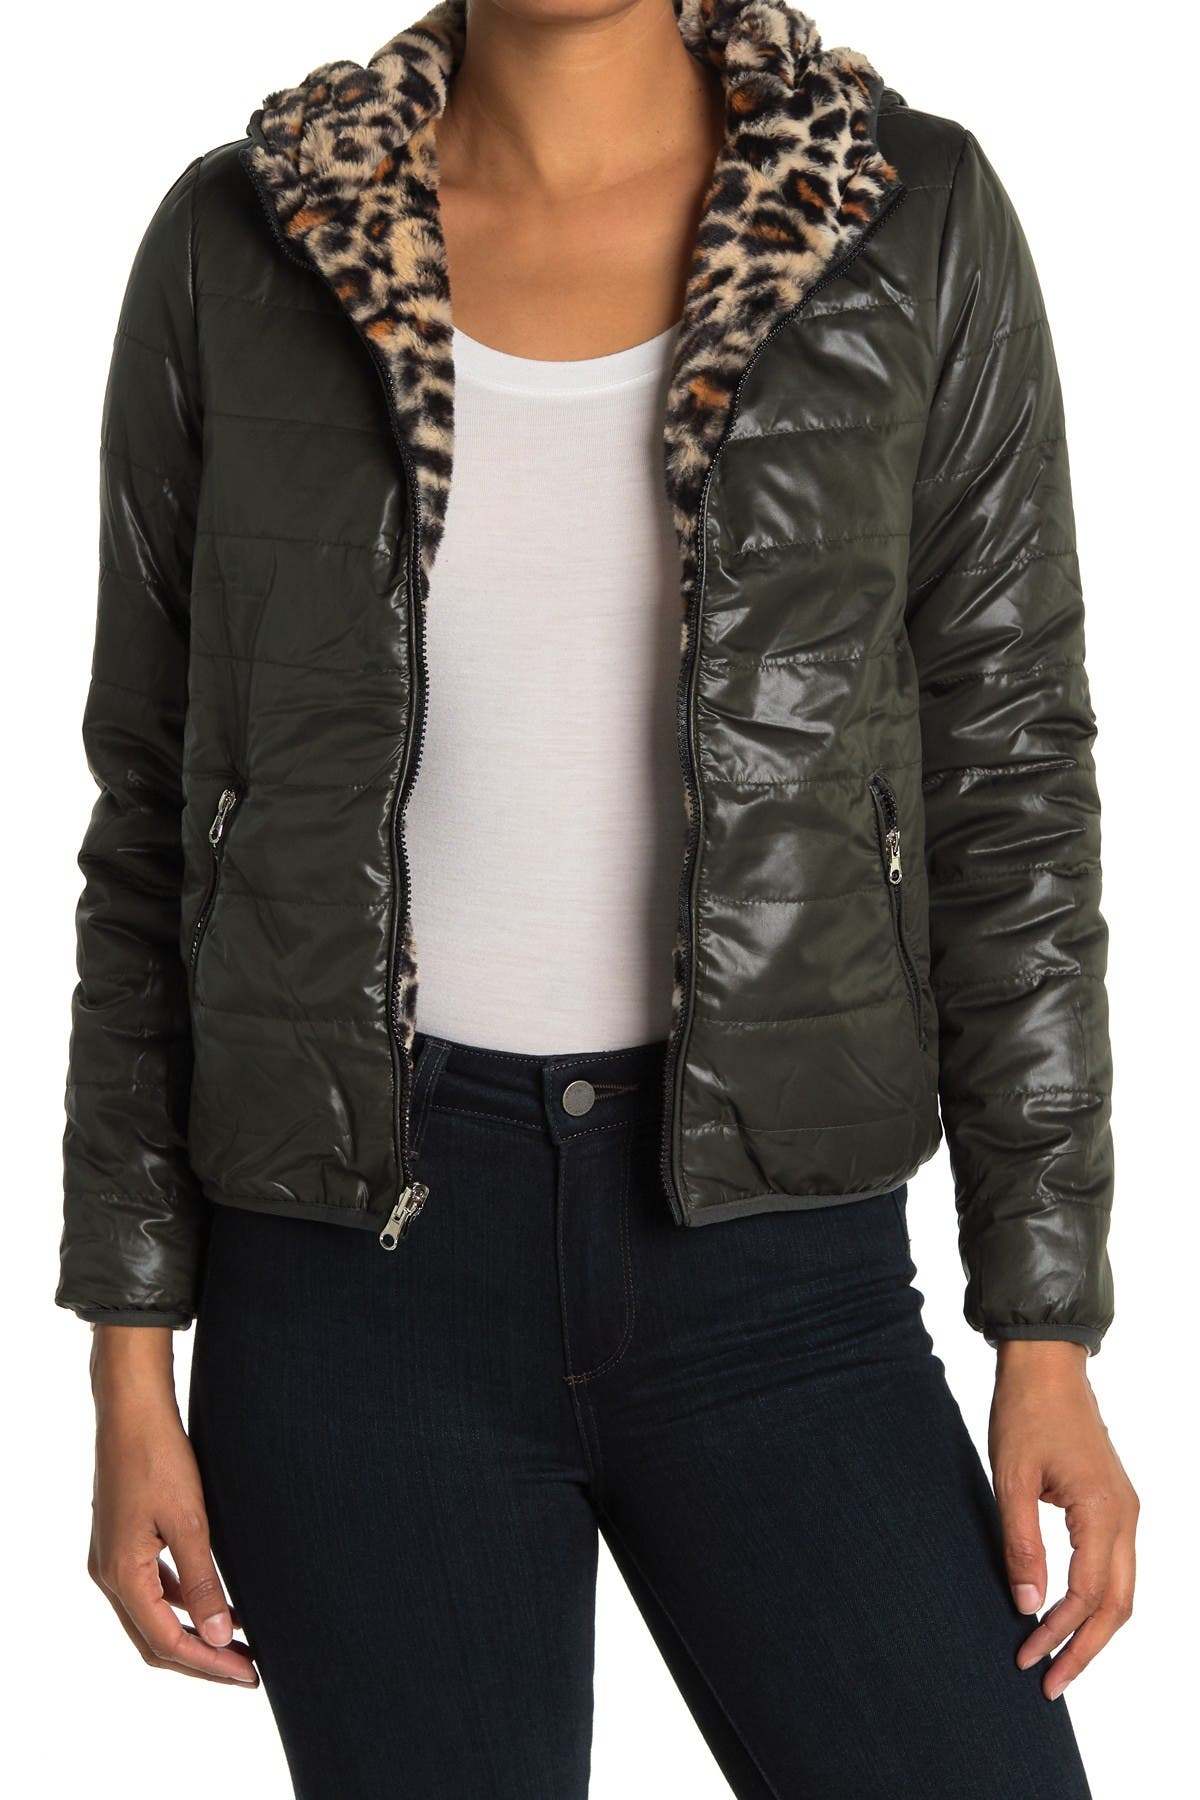 Image of Coffee Shop Reversible Leopard Faux Fur Zip Jacket